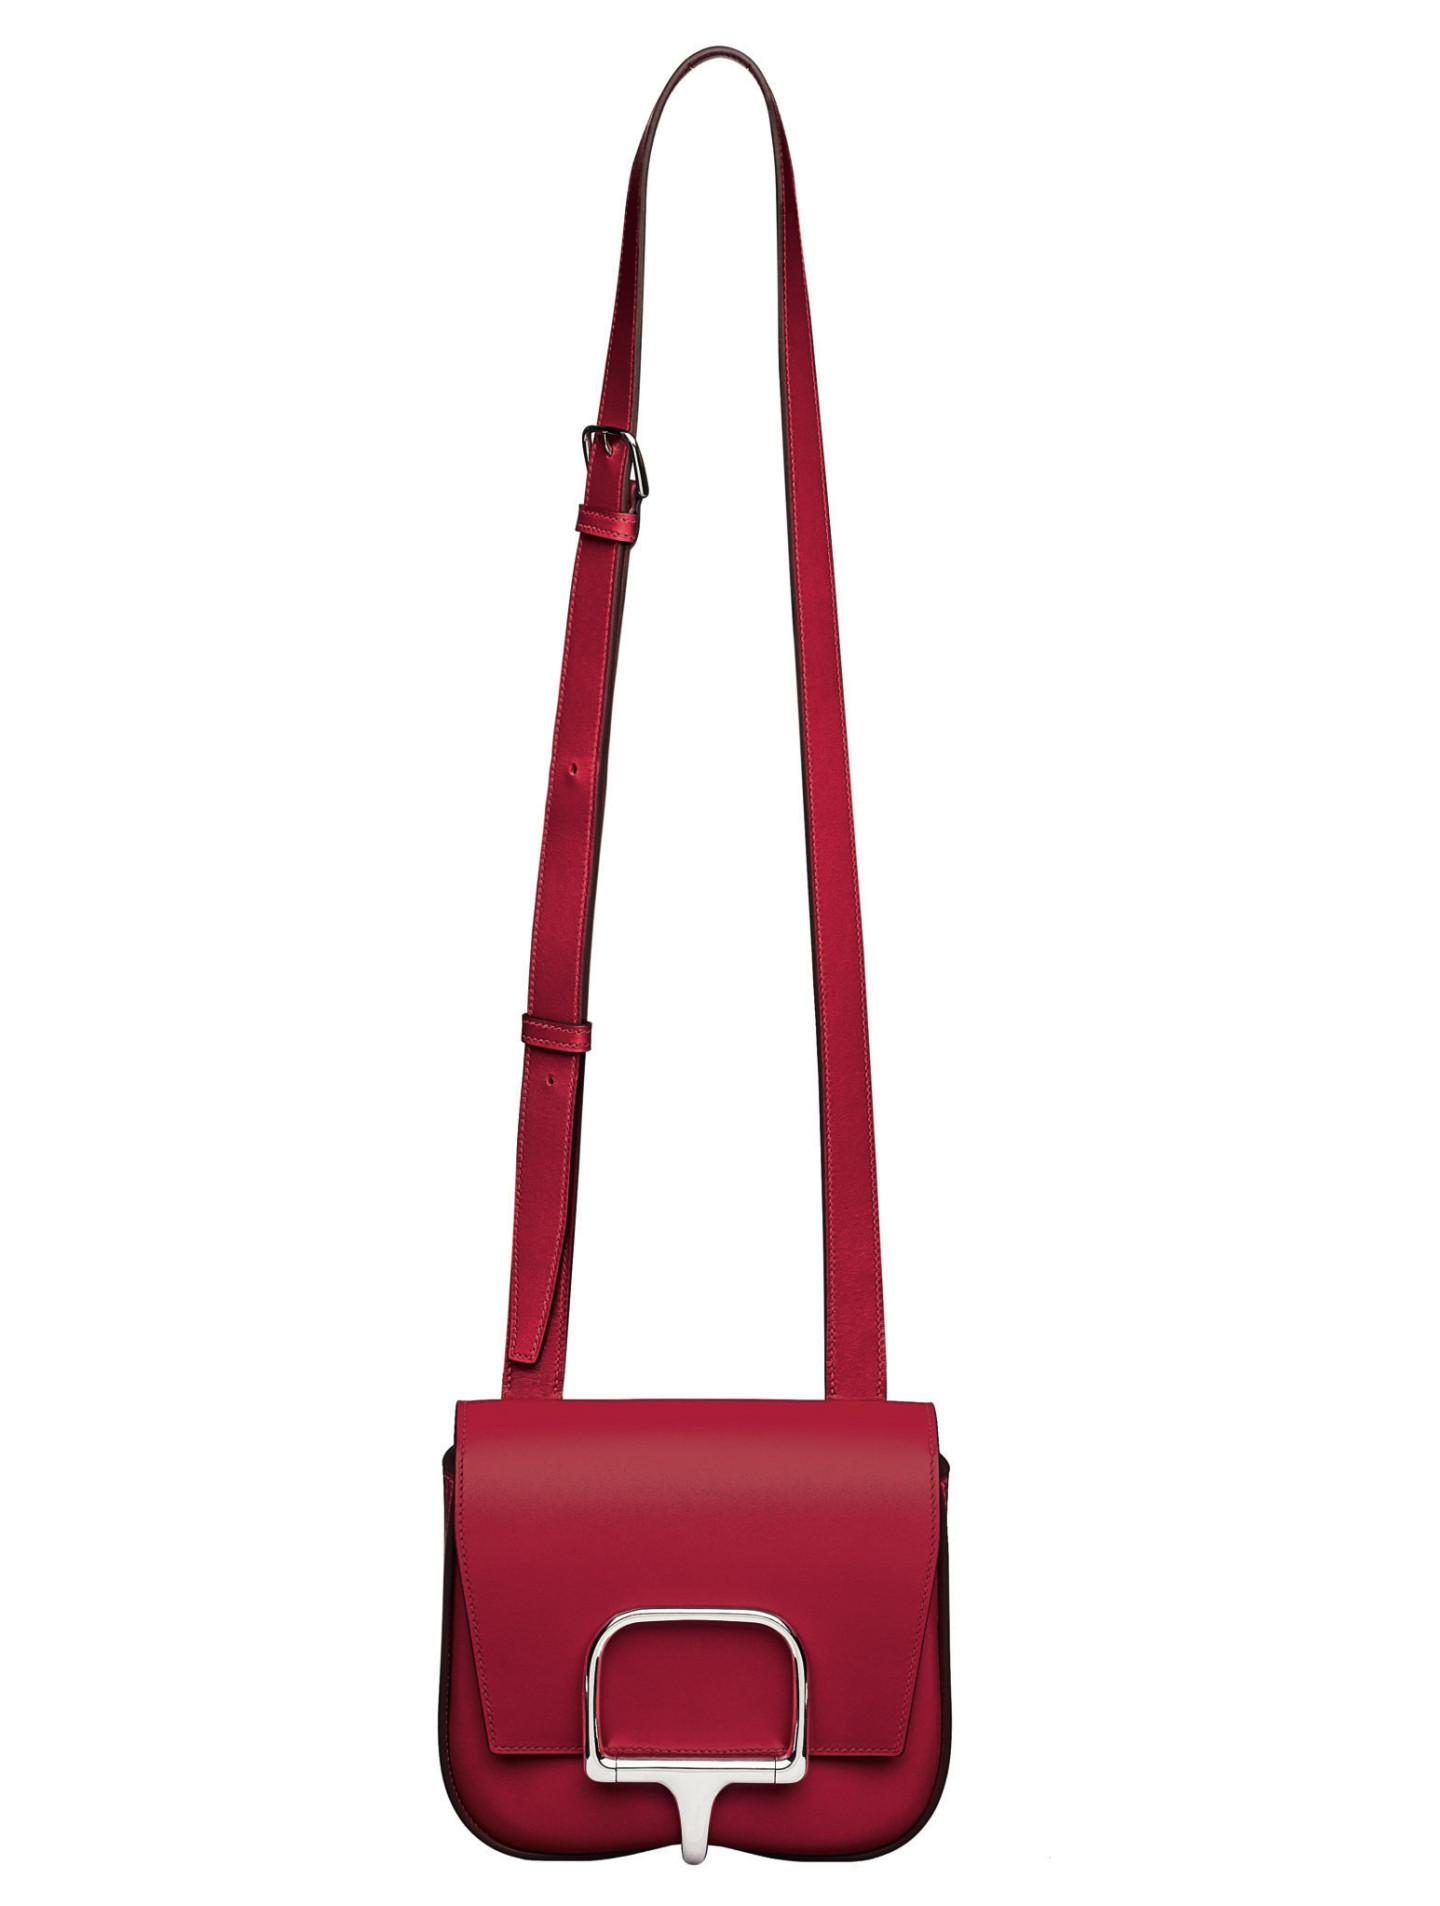 Hermès Della Cavalleria, цена по запросу (Hermès)